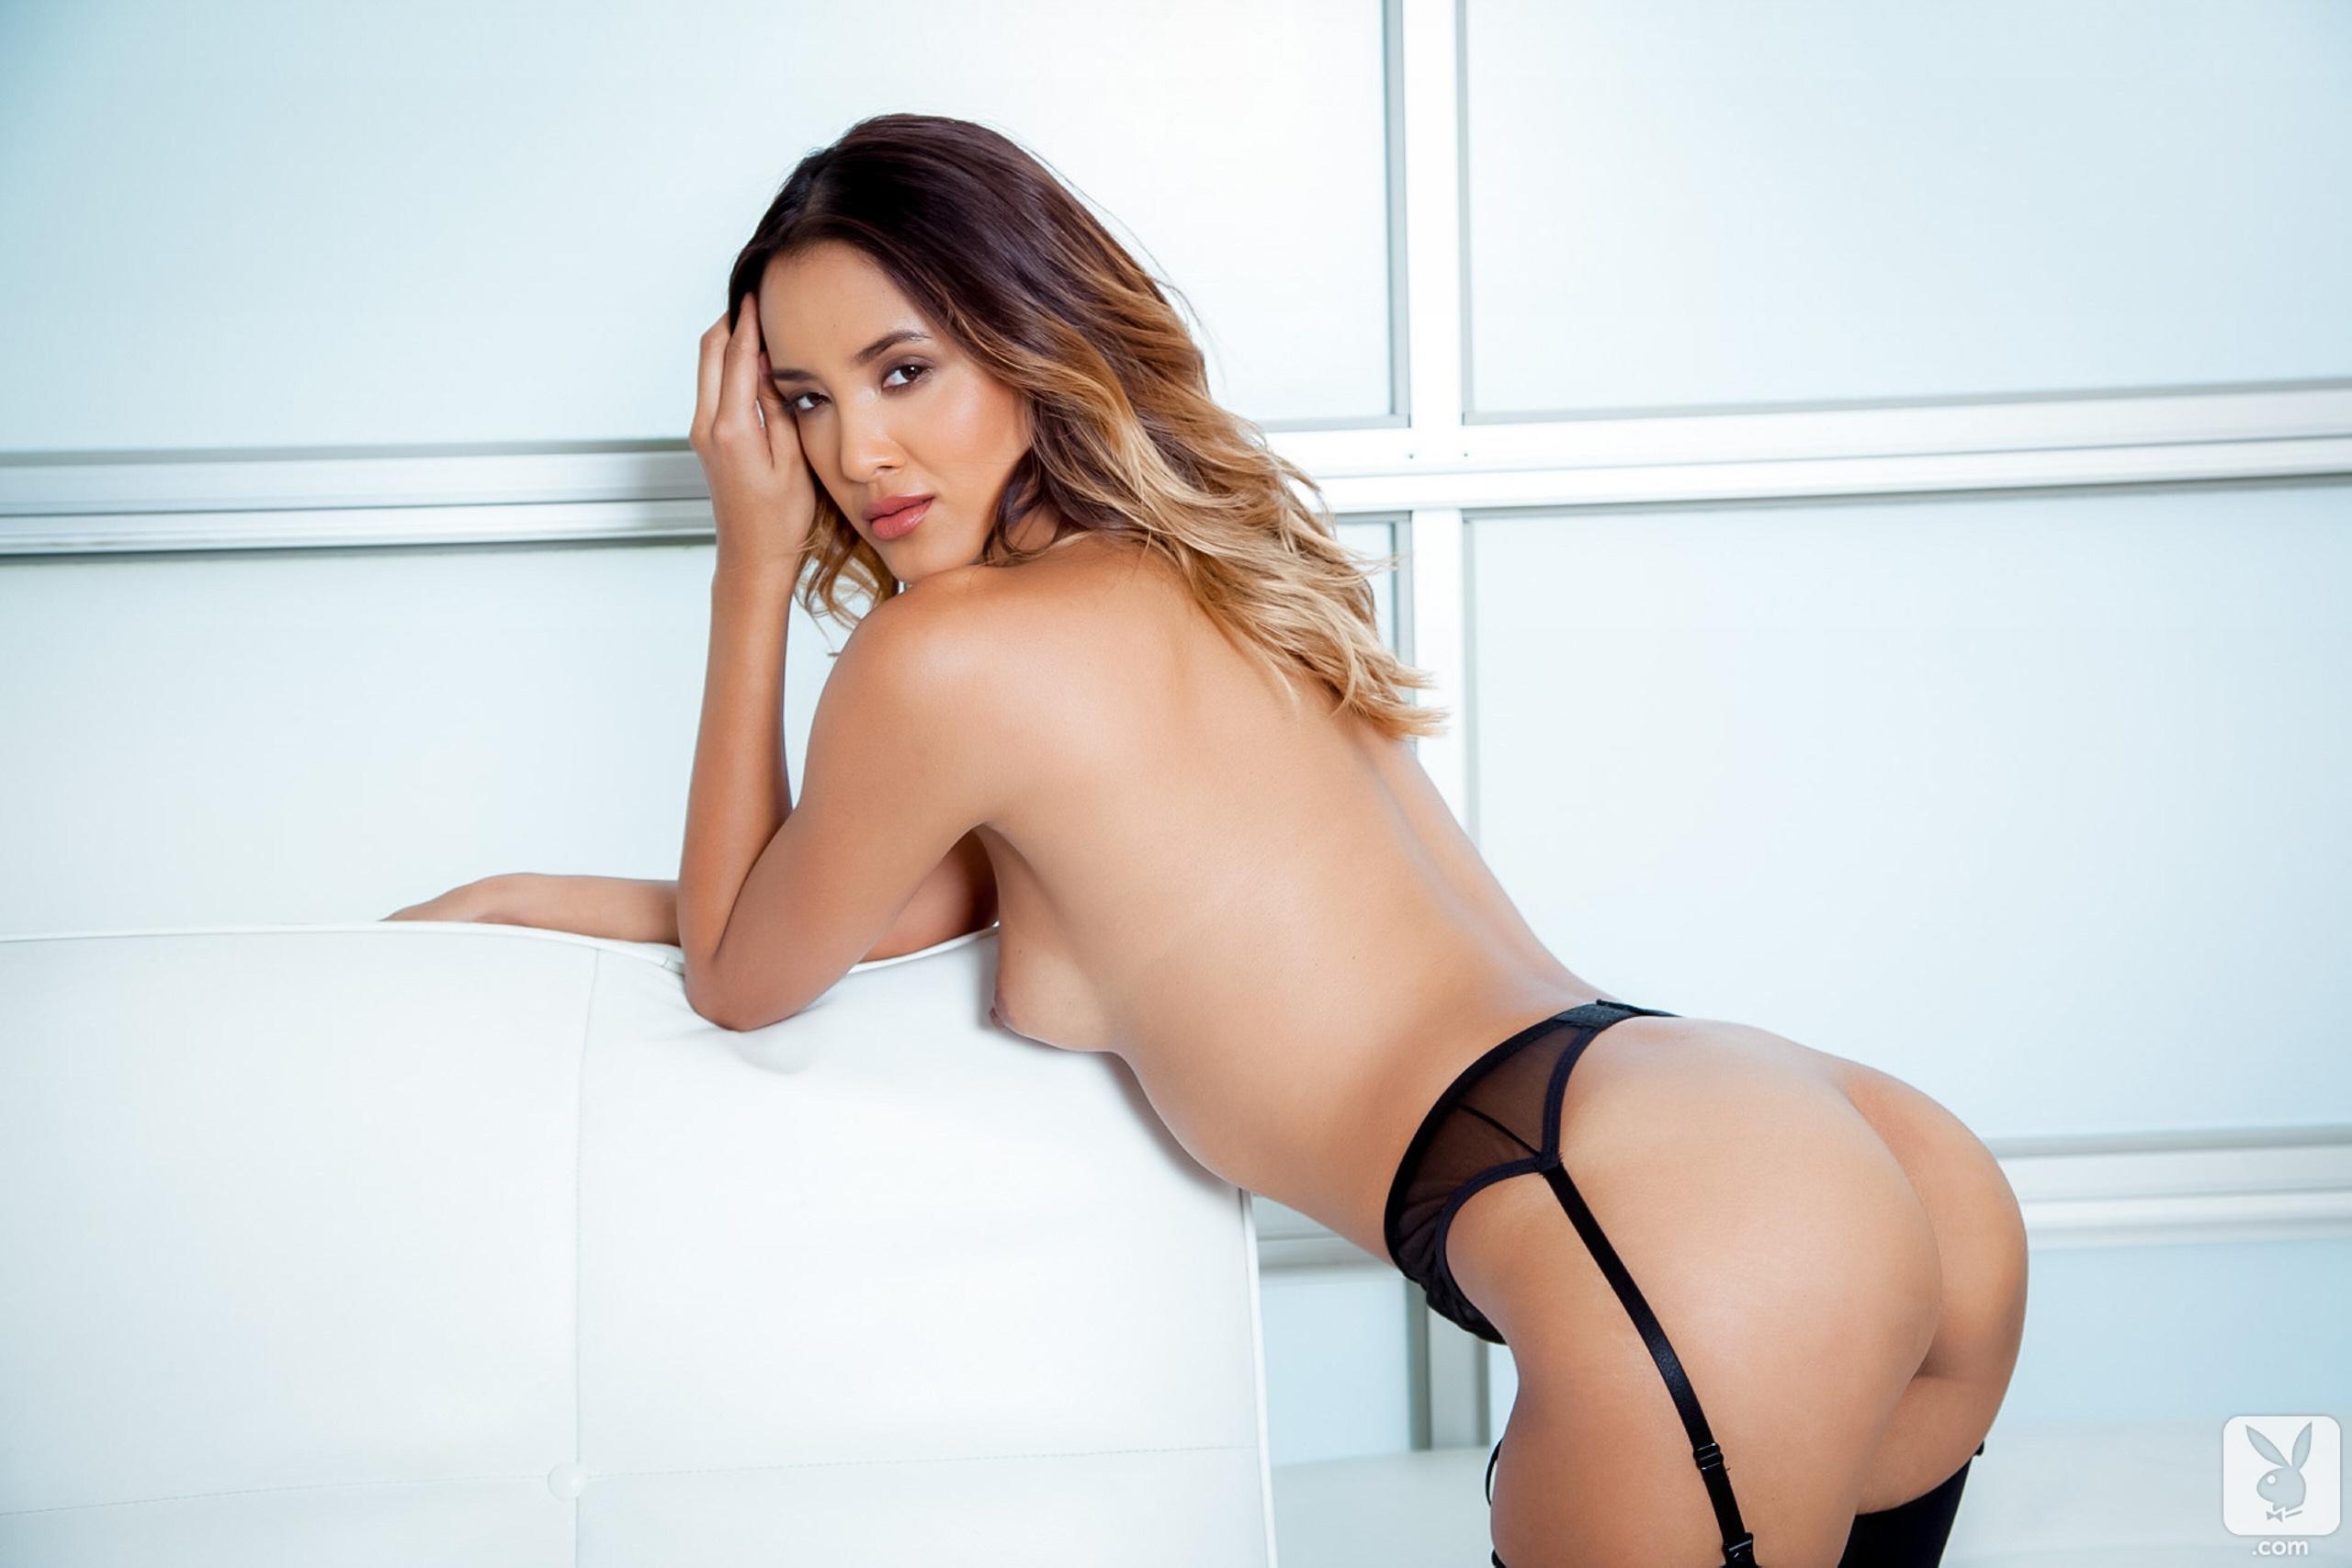 Kara monaco nude playboy